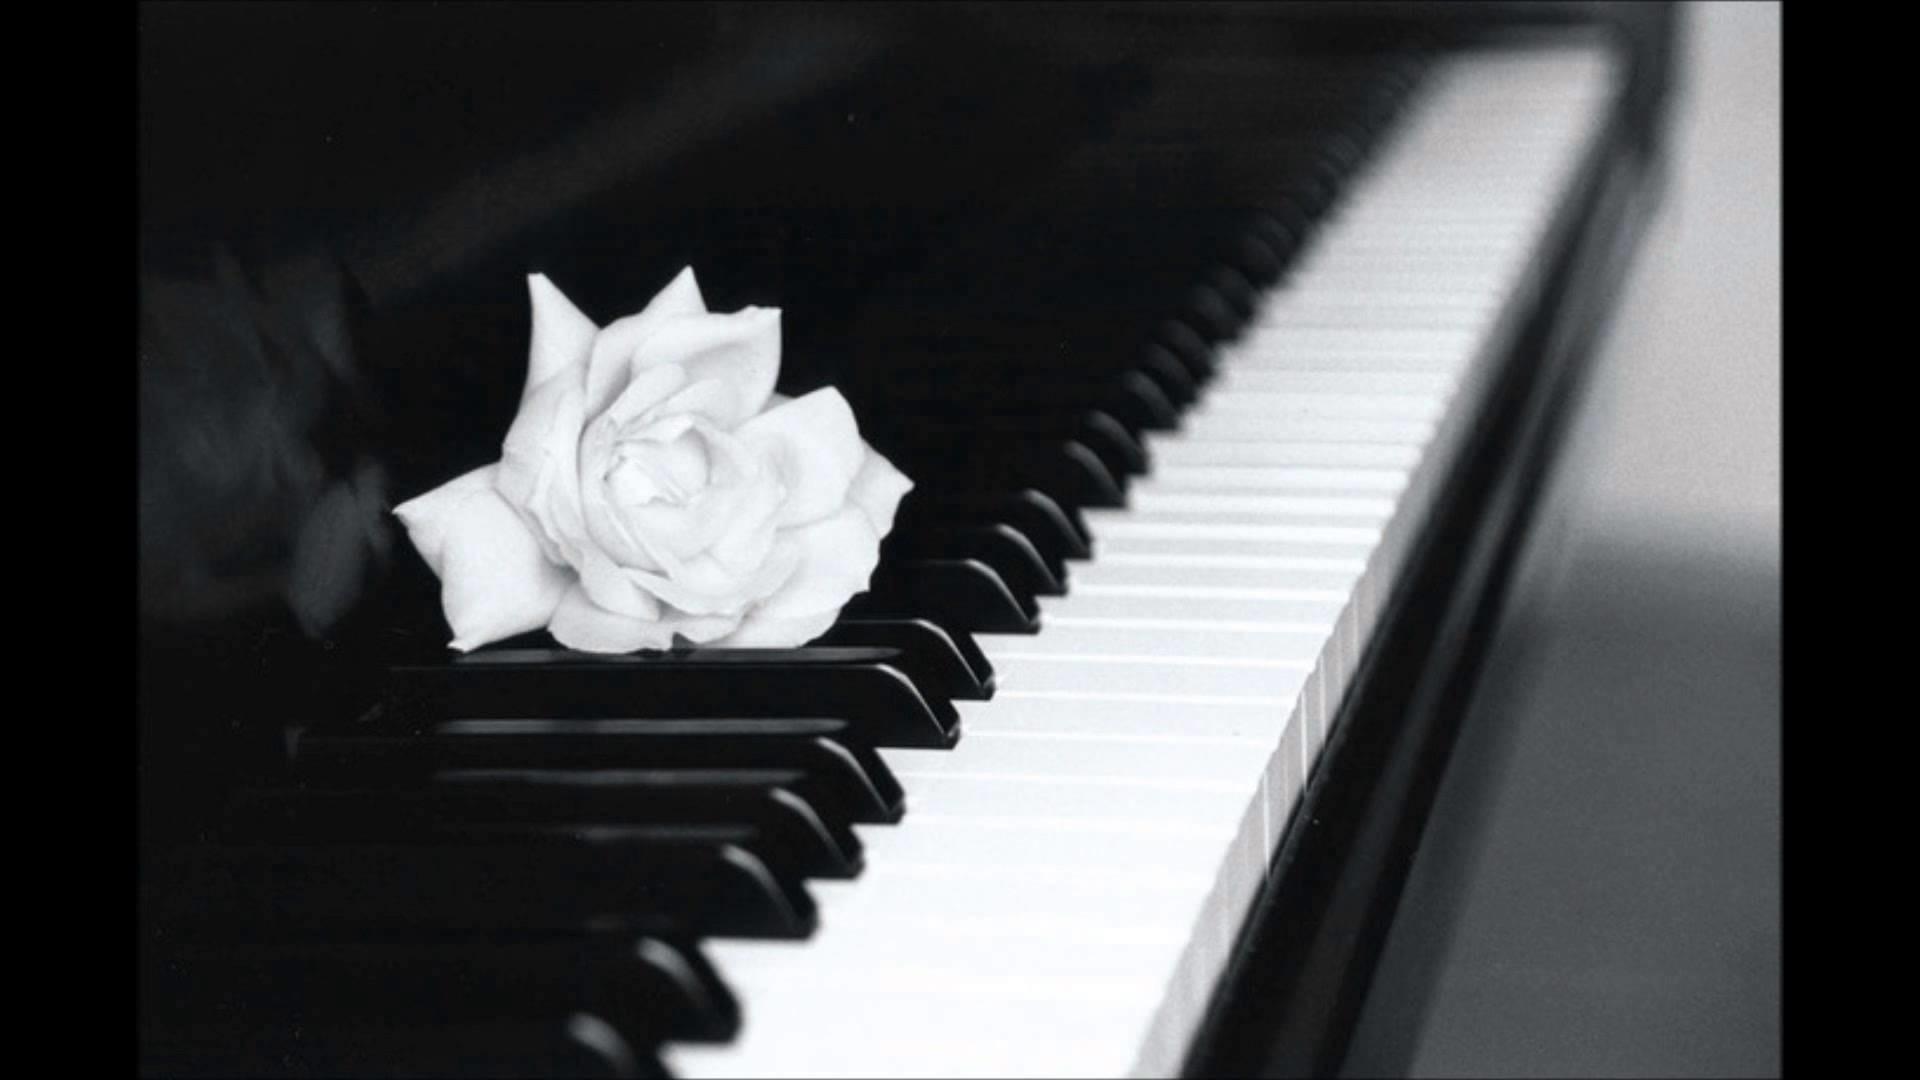 Hard Rap instrumental – Moonlight Sonata 2013 BragBeats hip hop,  instrumental piano violin – YouTube